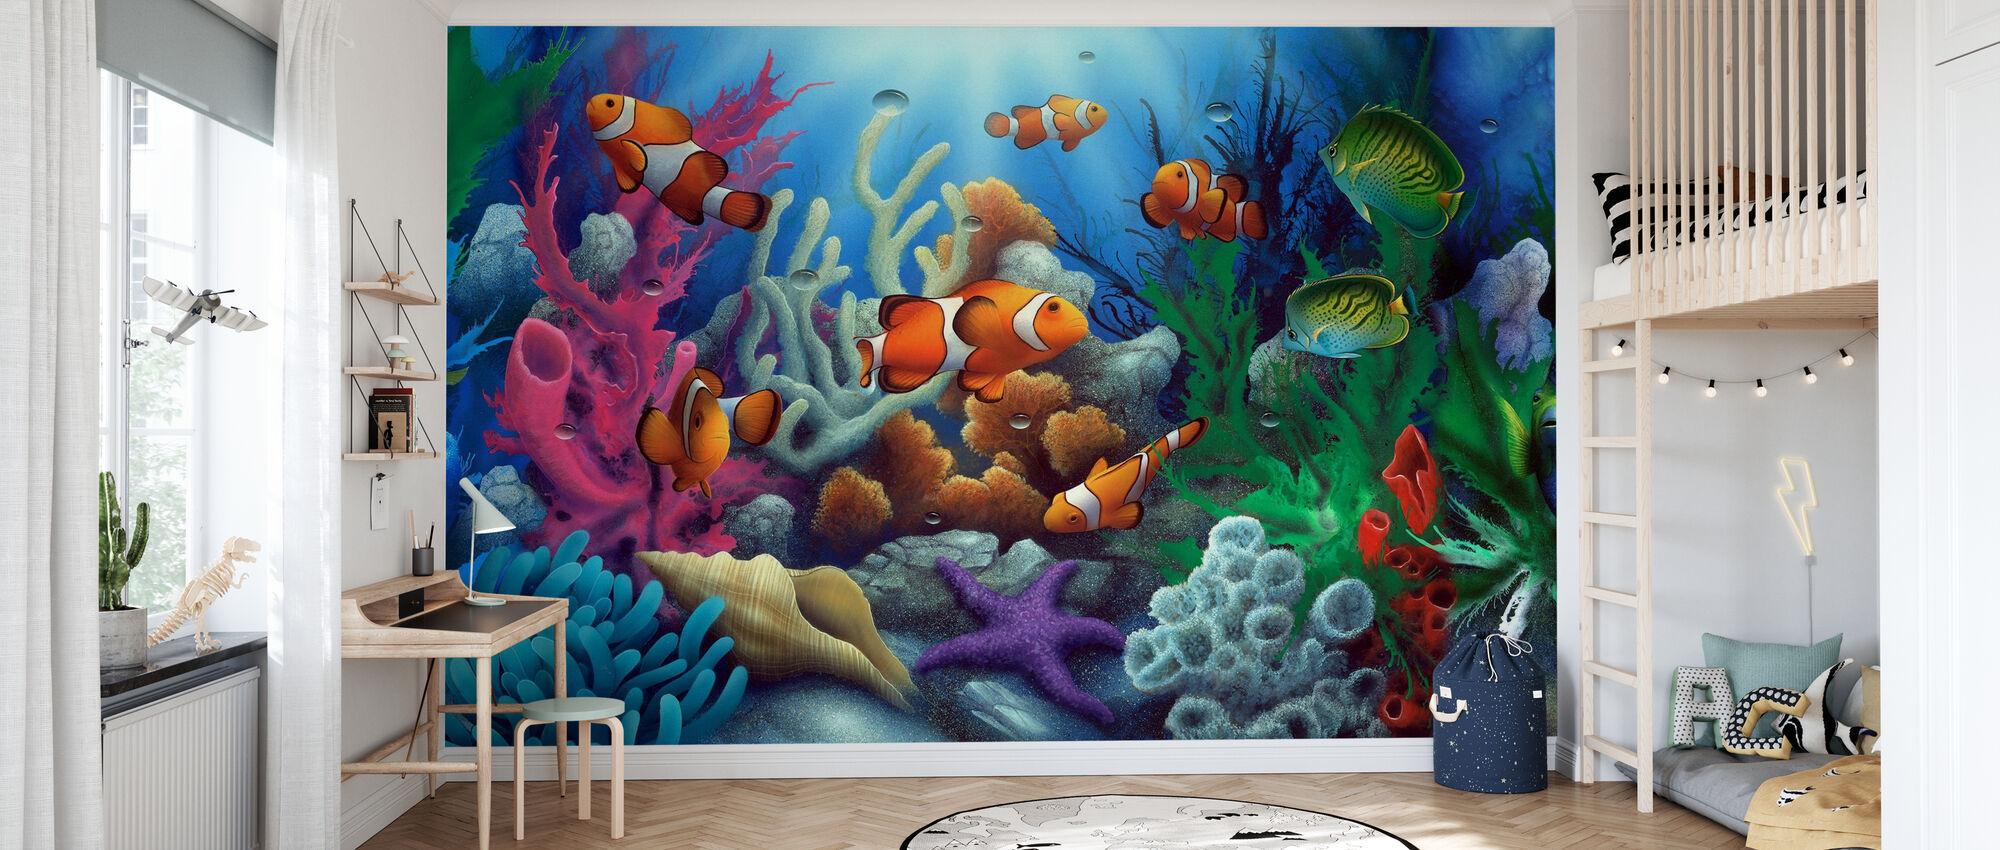 Around the World 1 - Wallpaper - Kids Room